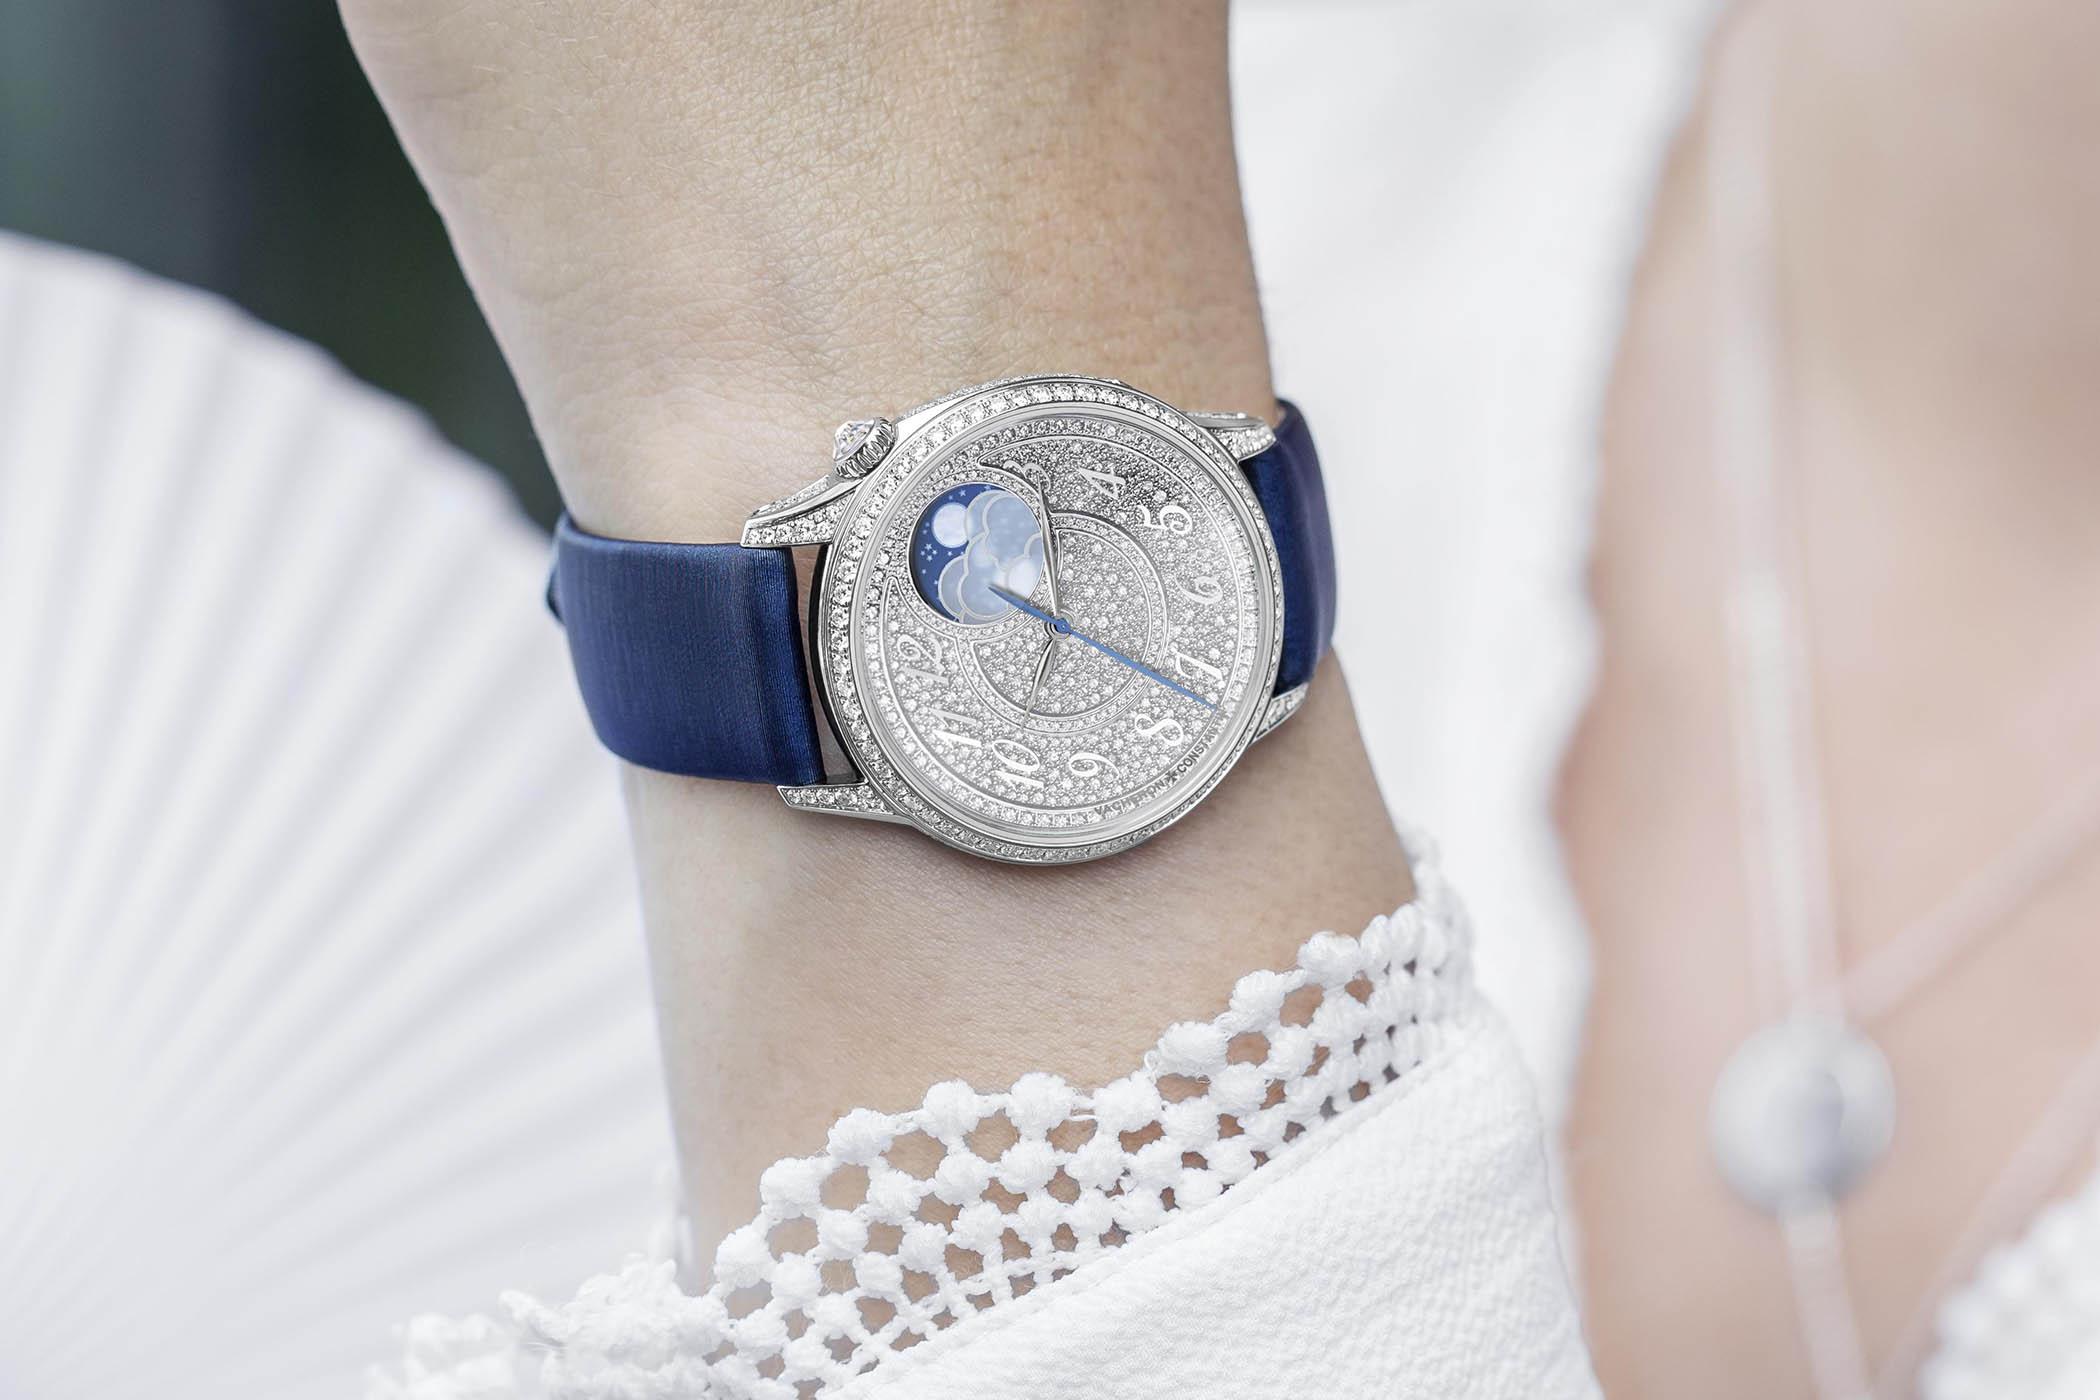 Vacheron Constantin Egerie collection 2020 womens watch - 3